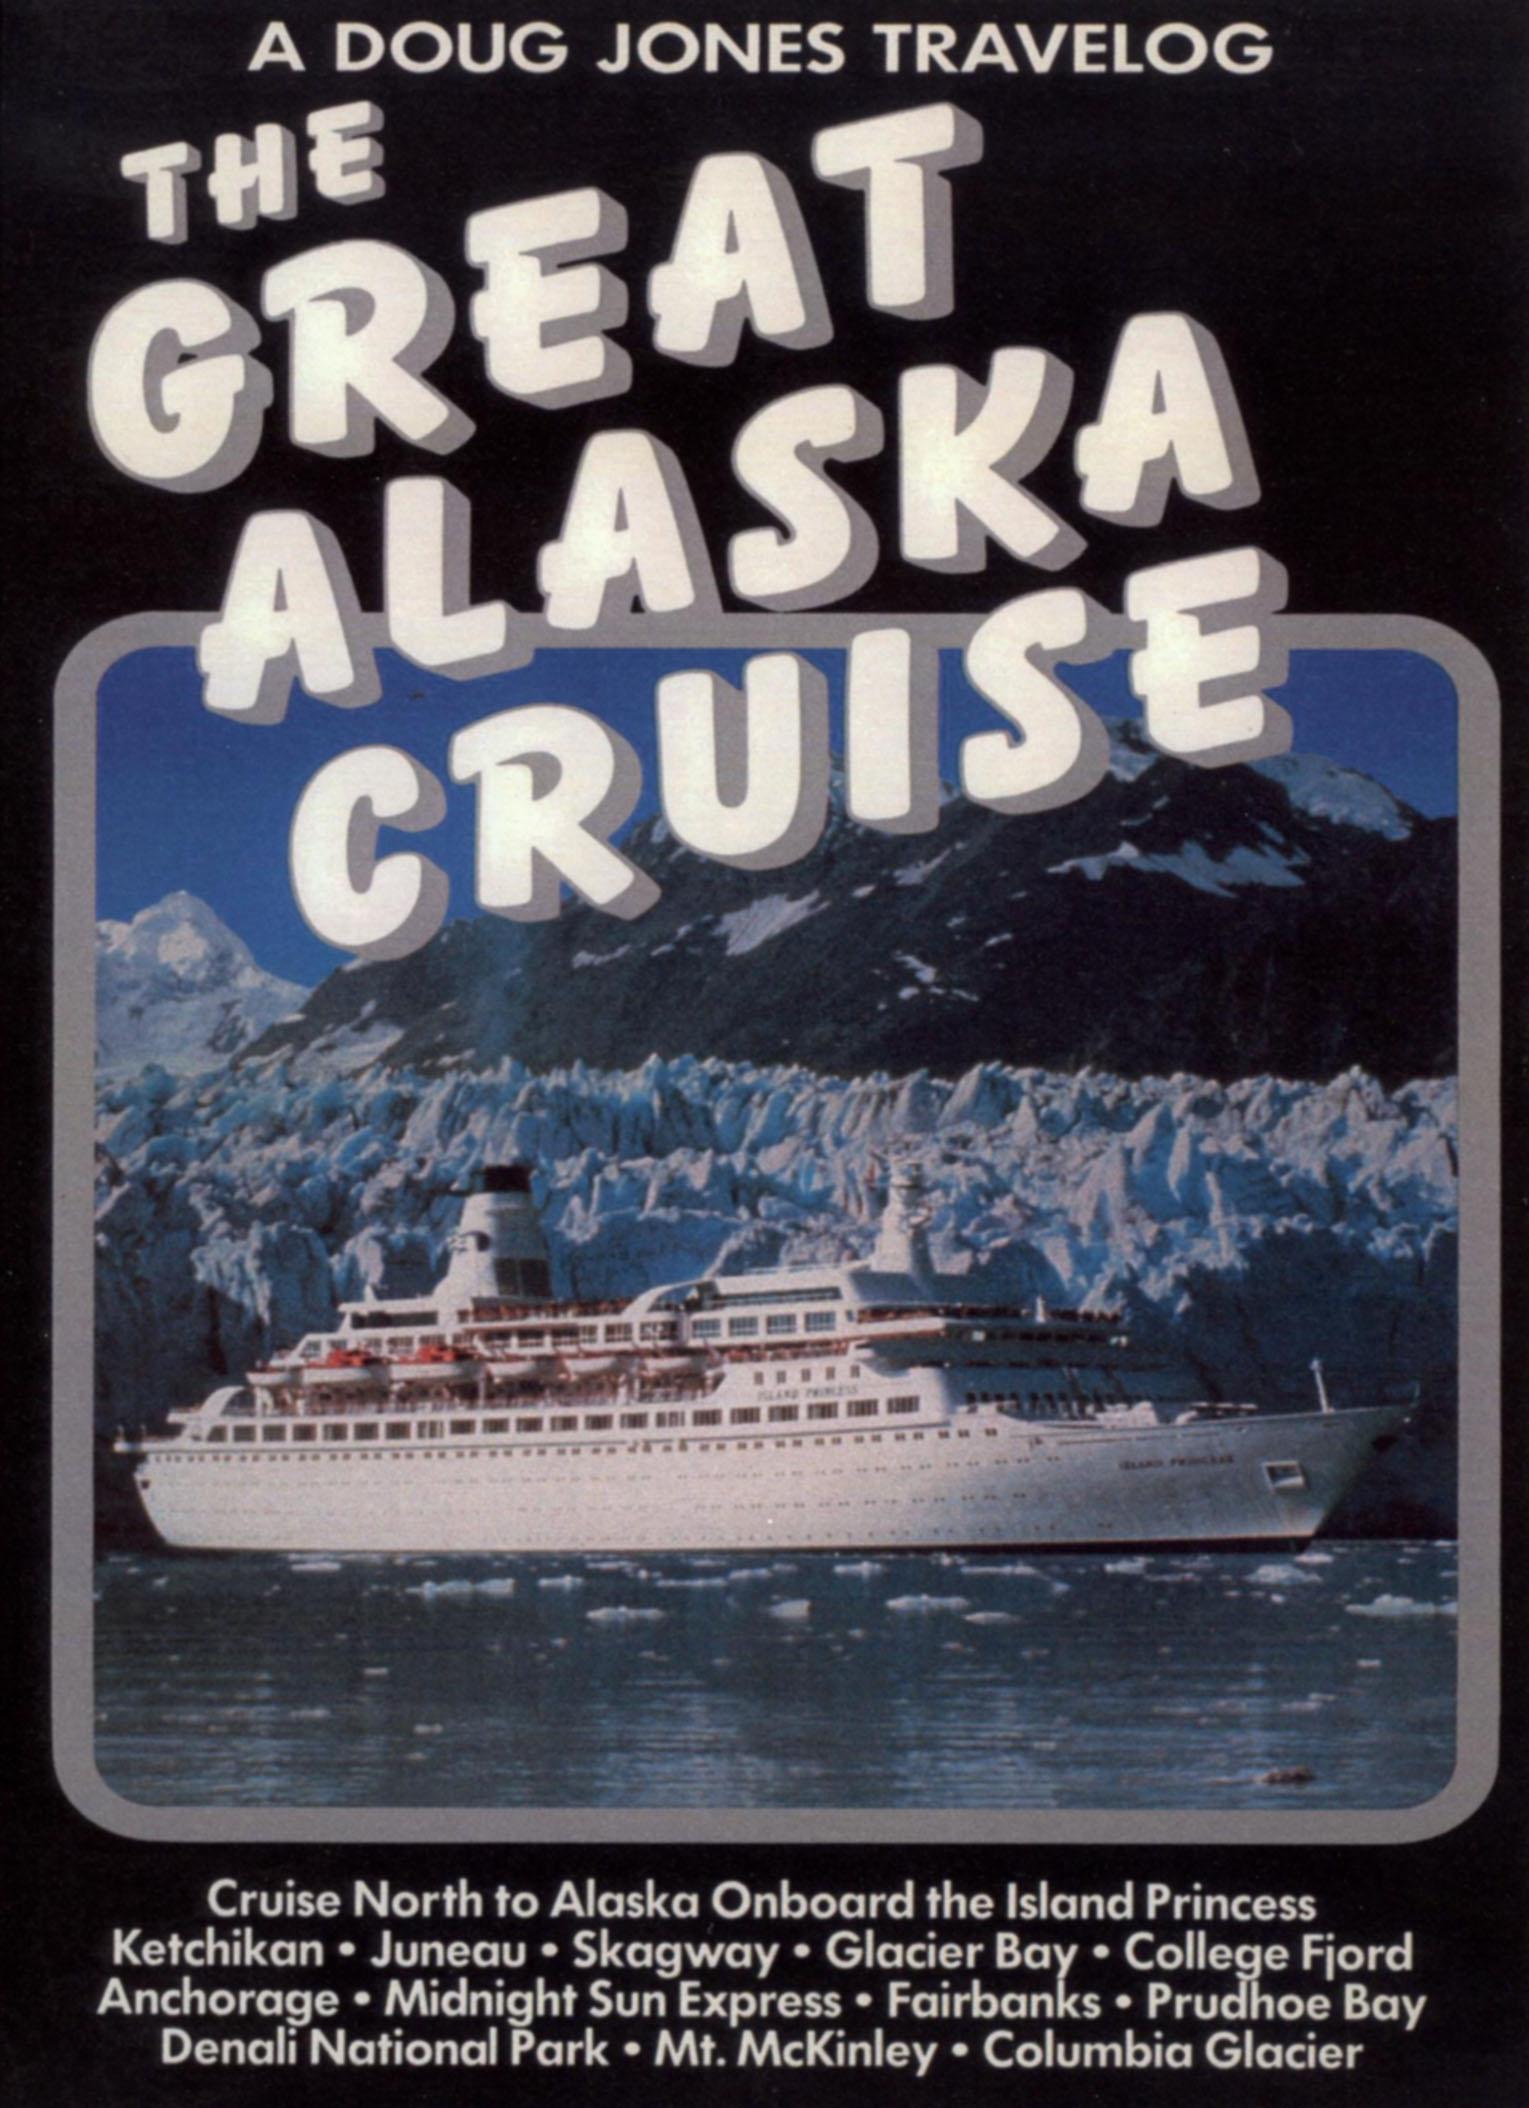 The Great Alaska Cruise